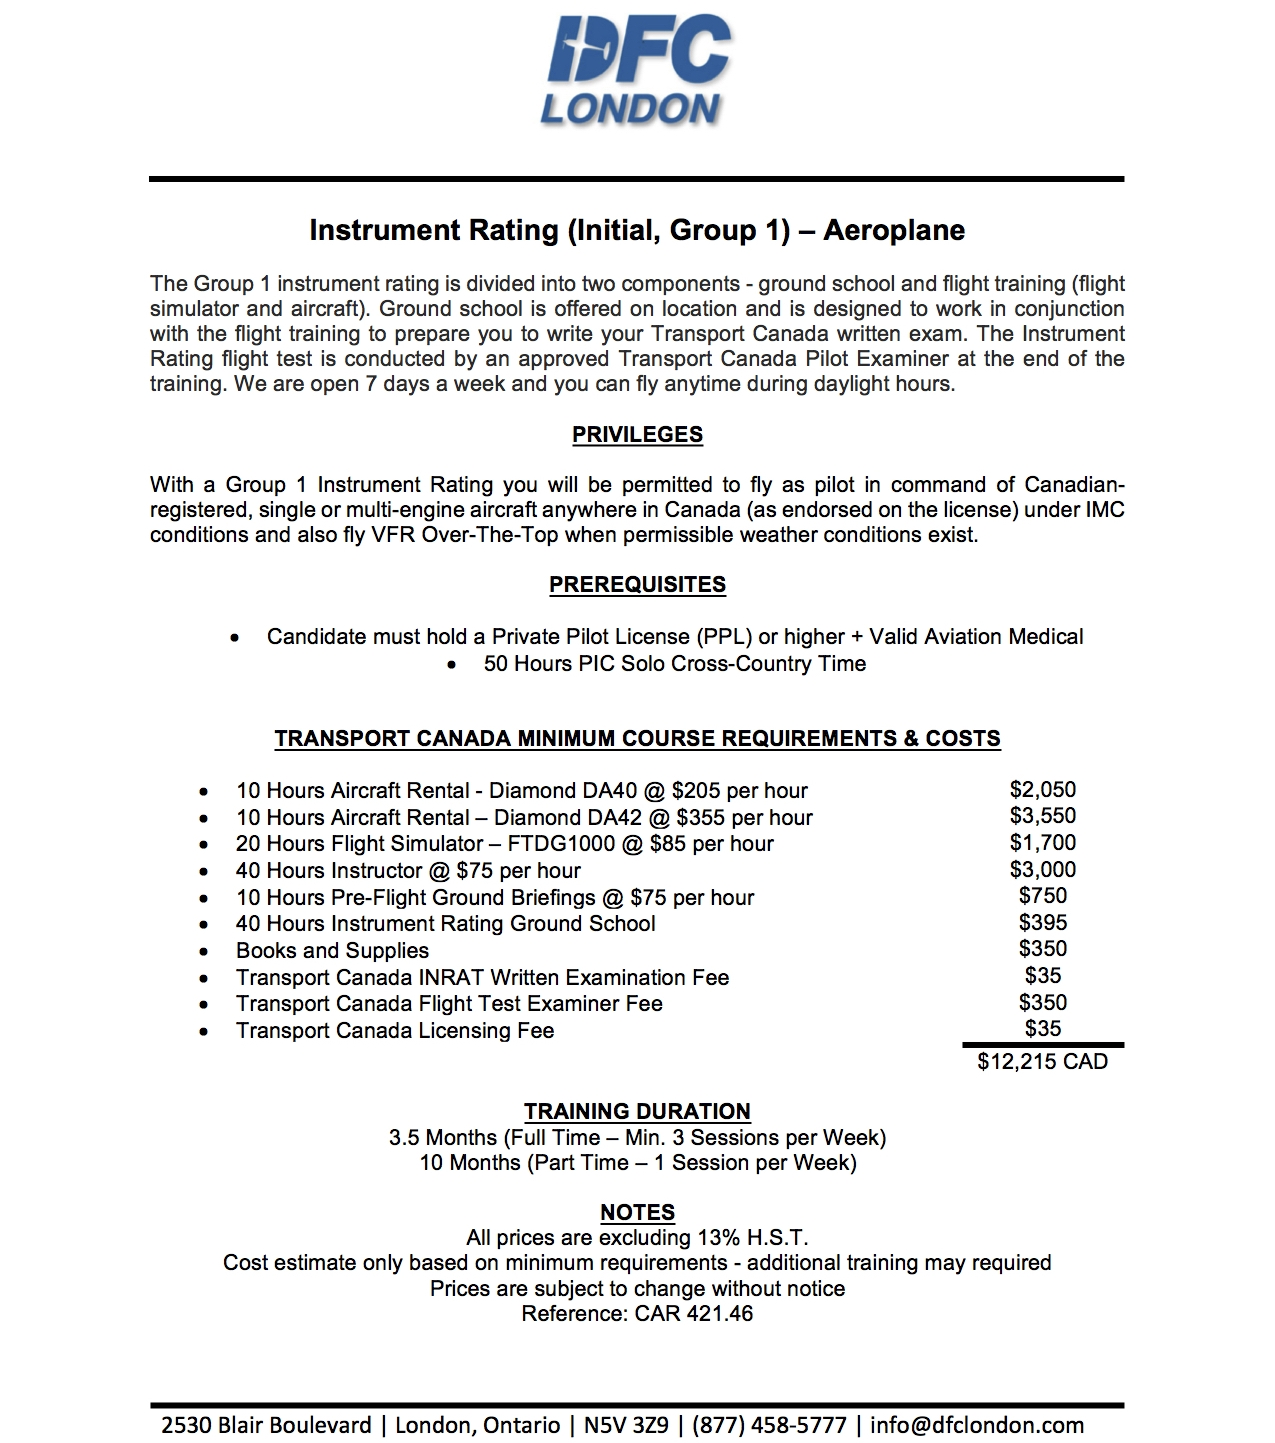 DFC London | Instrument Rating GP1 Initial.jpg